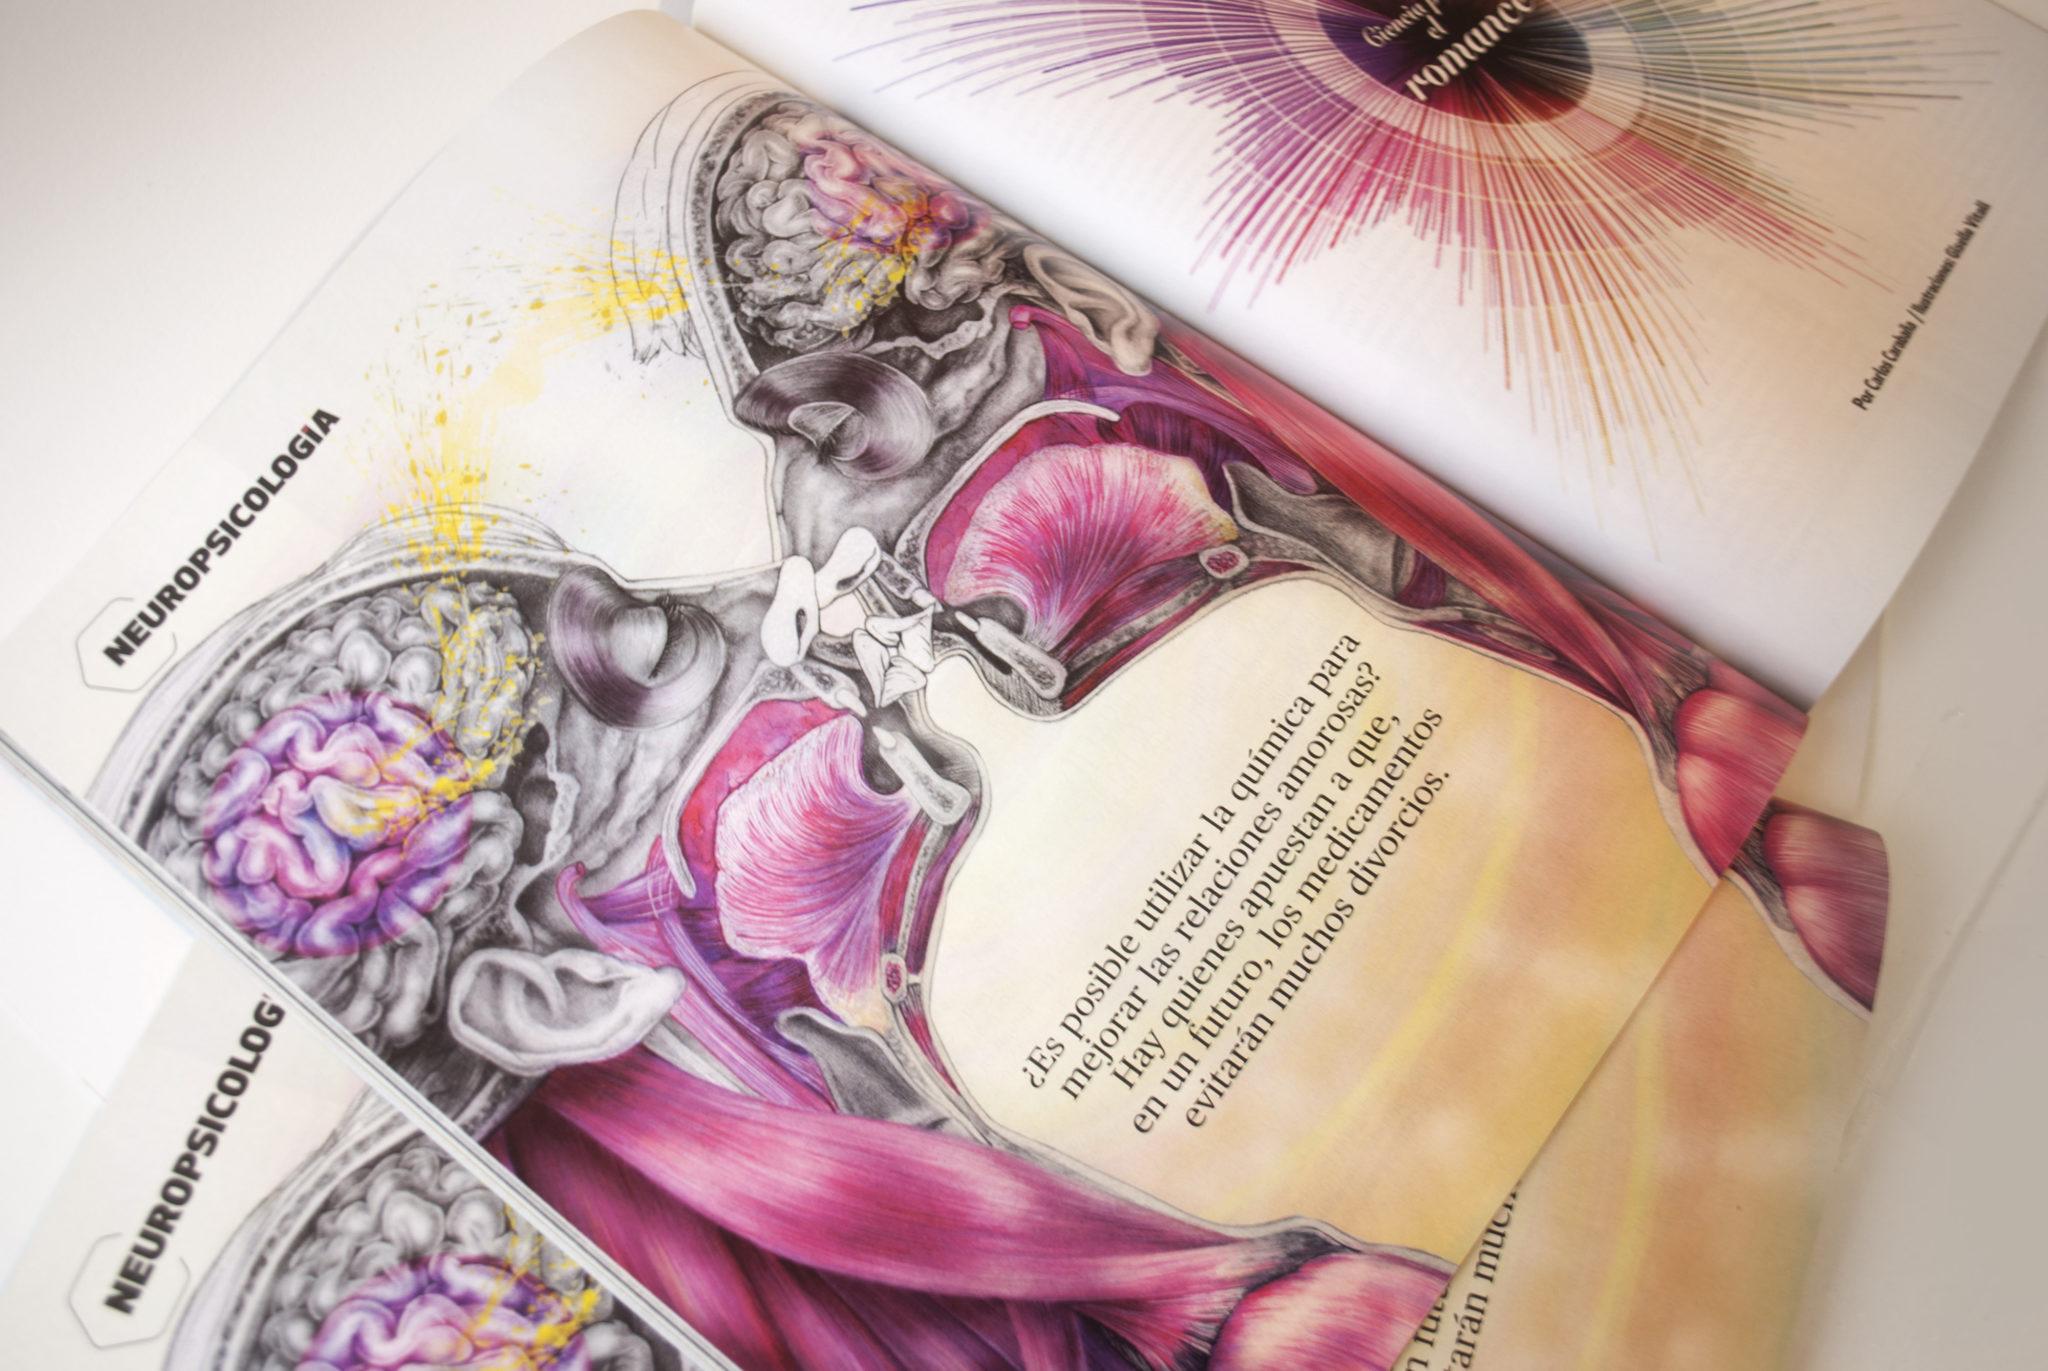 Quo México ilustracion divulgativa anatomia